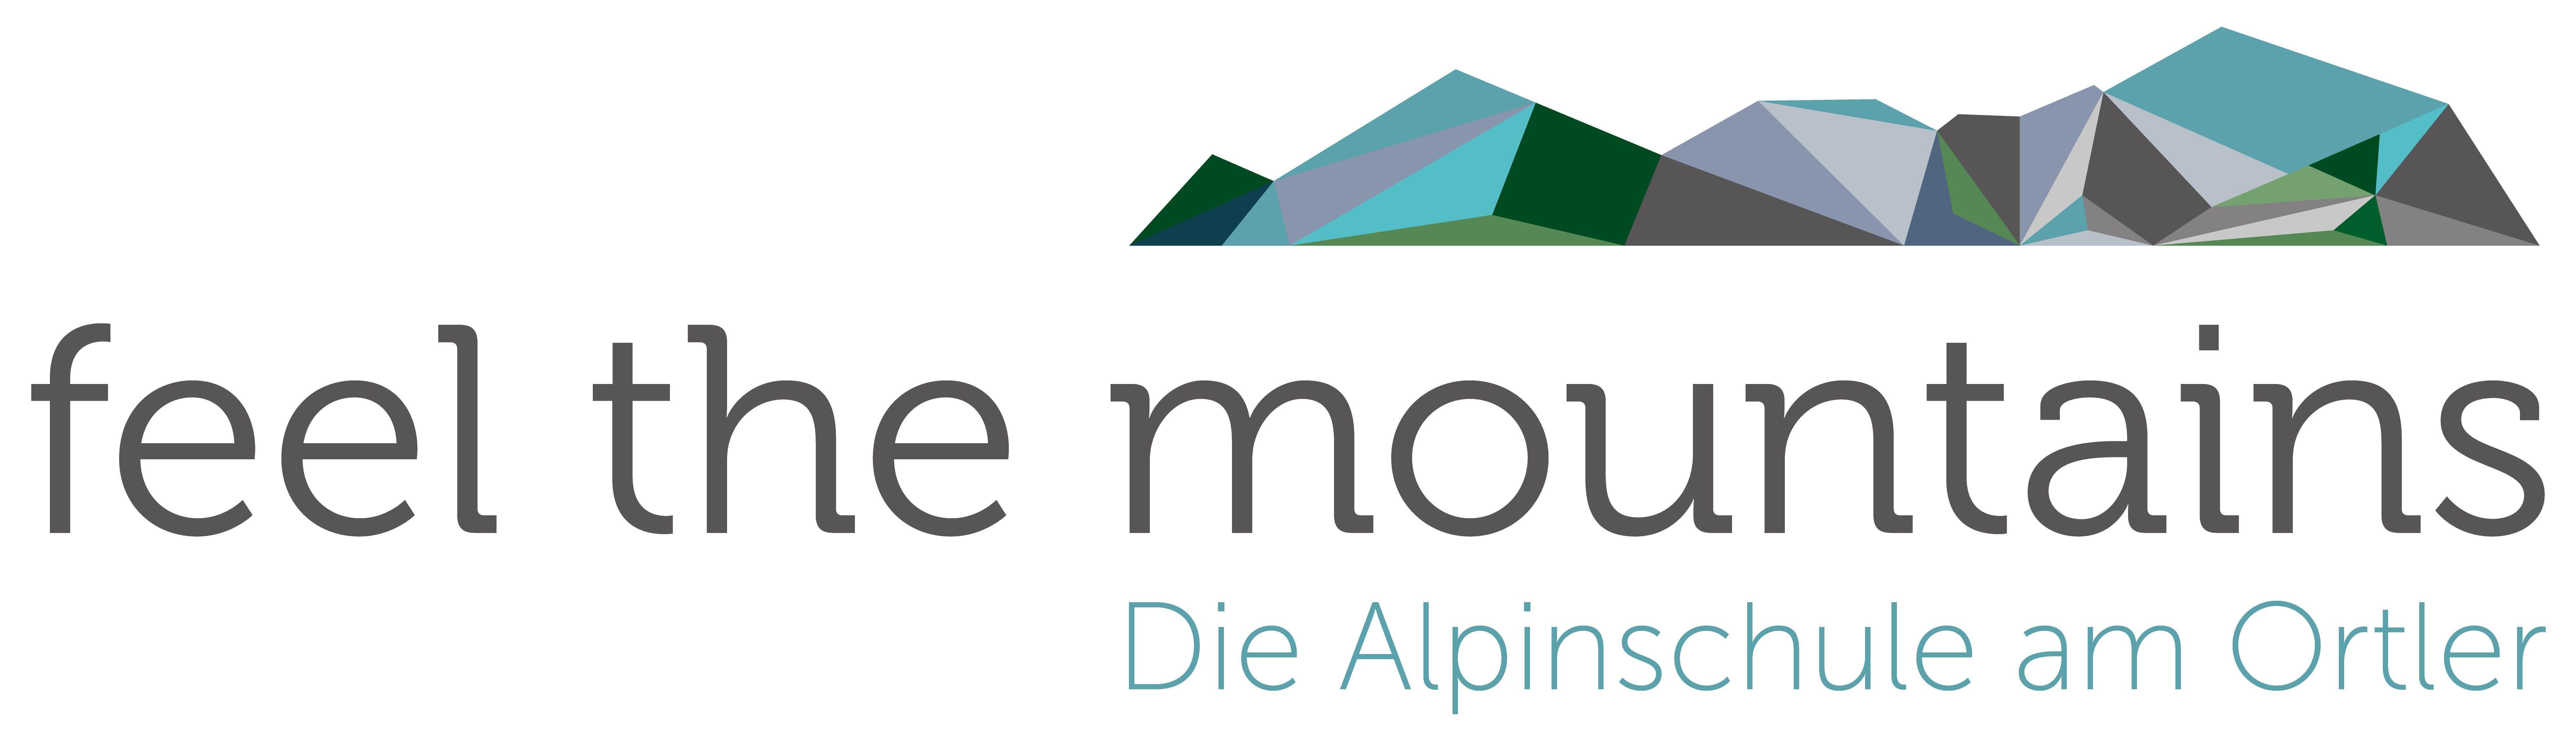 Feel_the_mountains_Logo.jpg